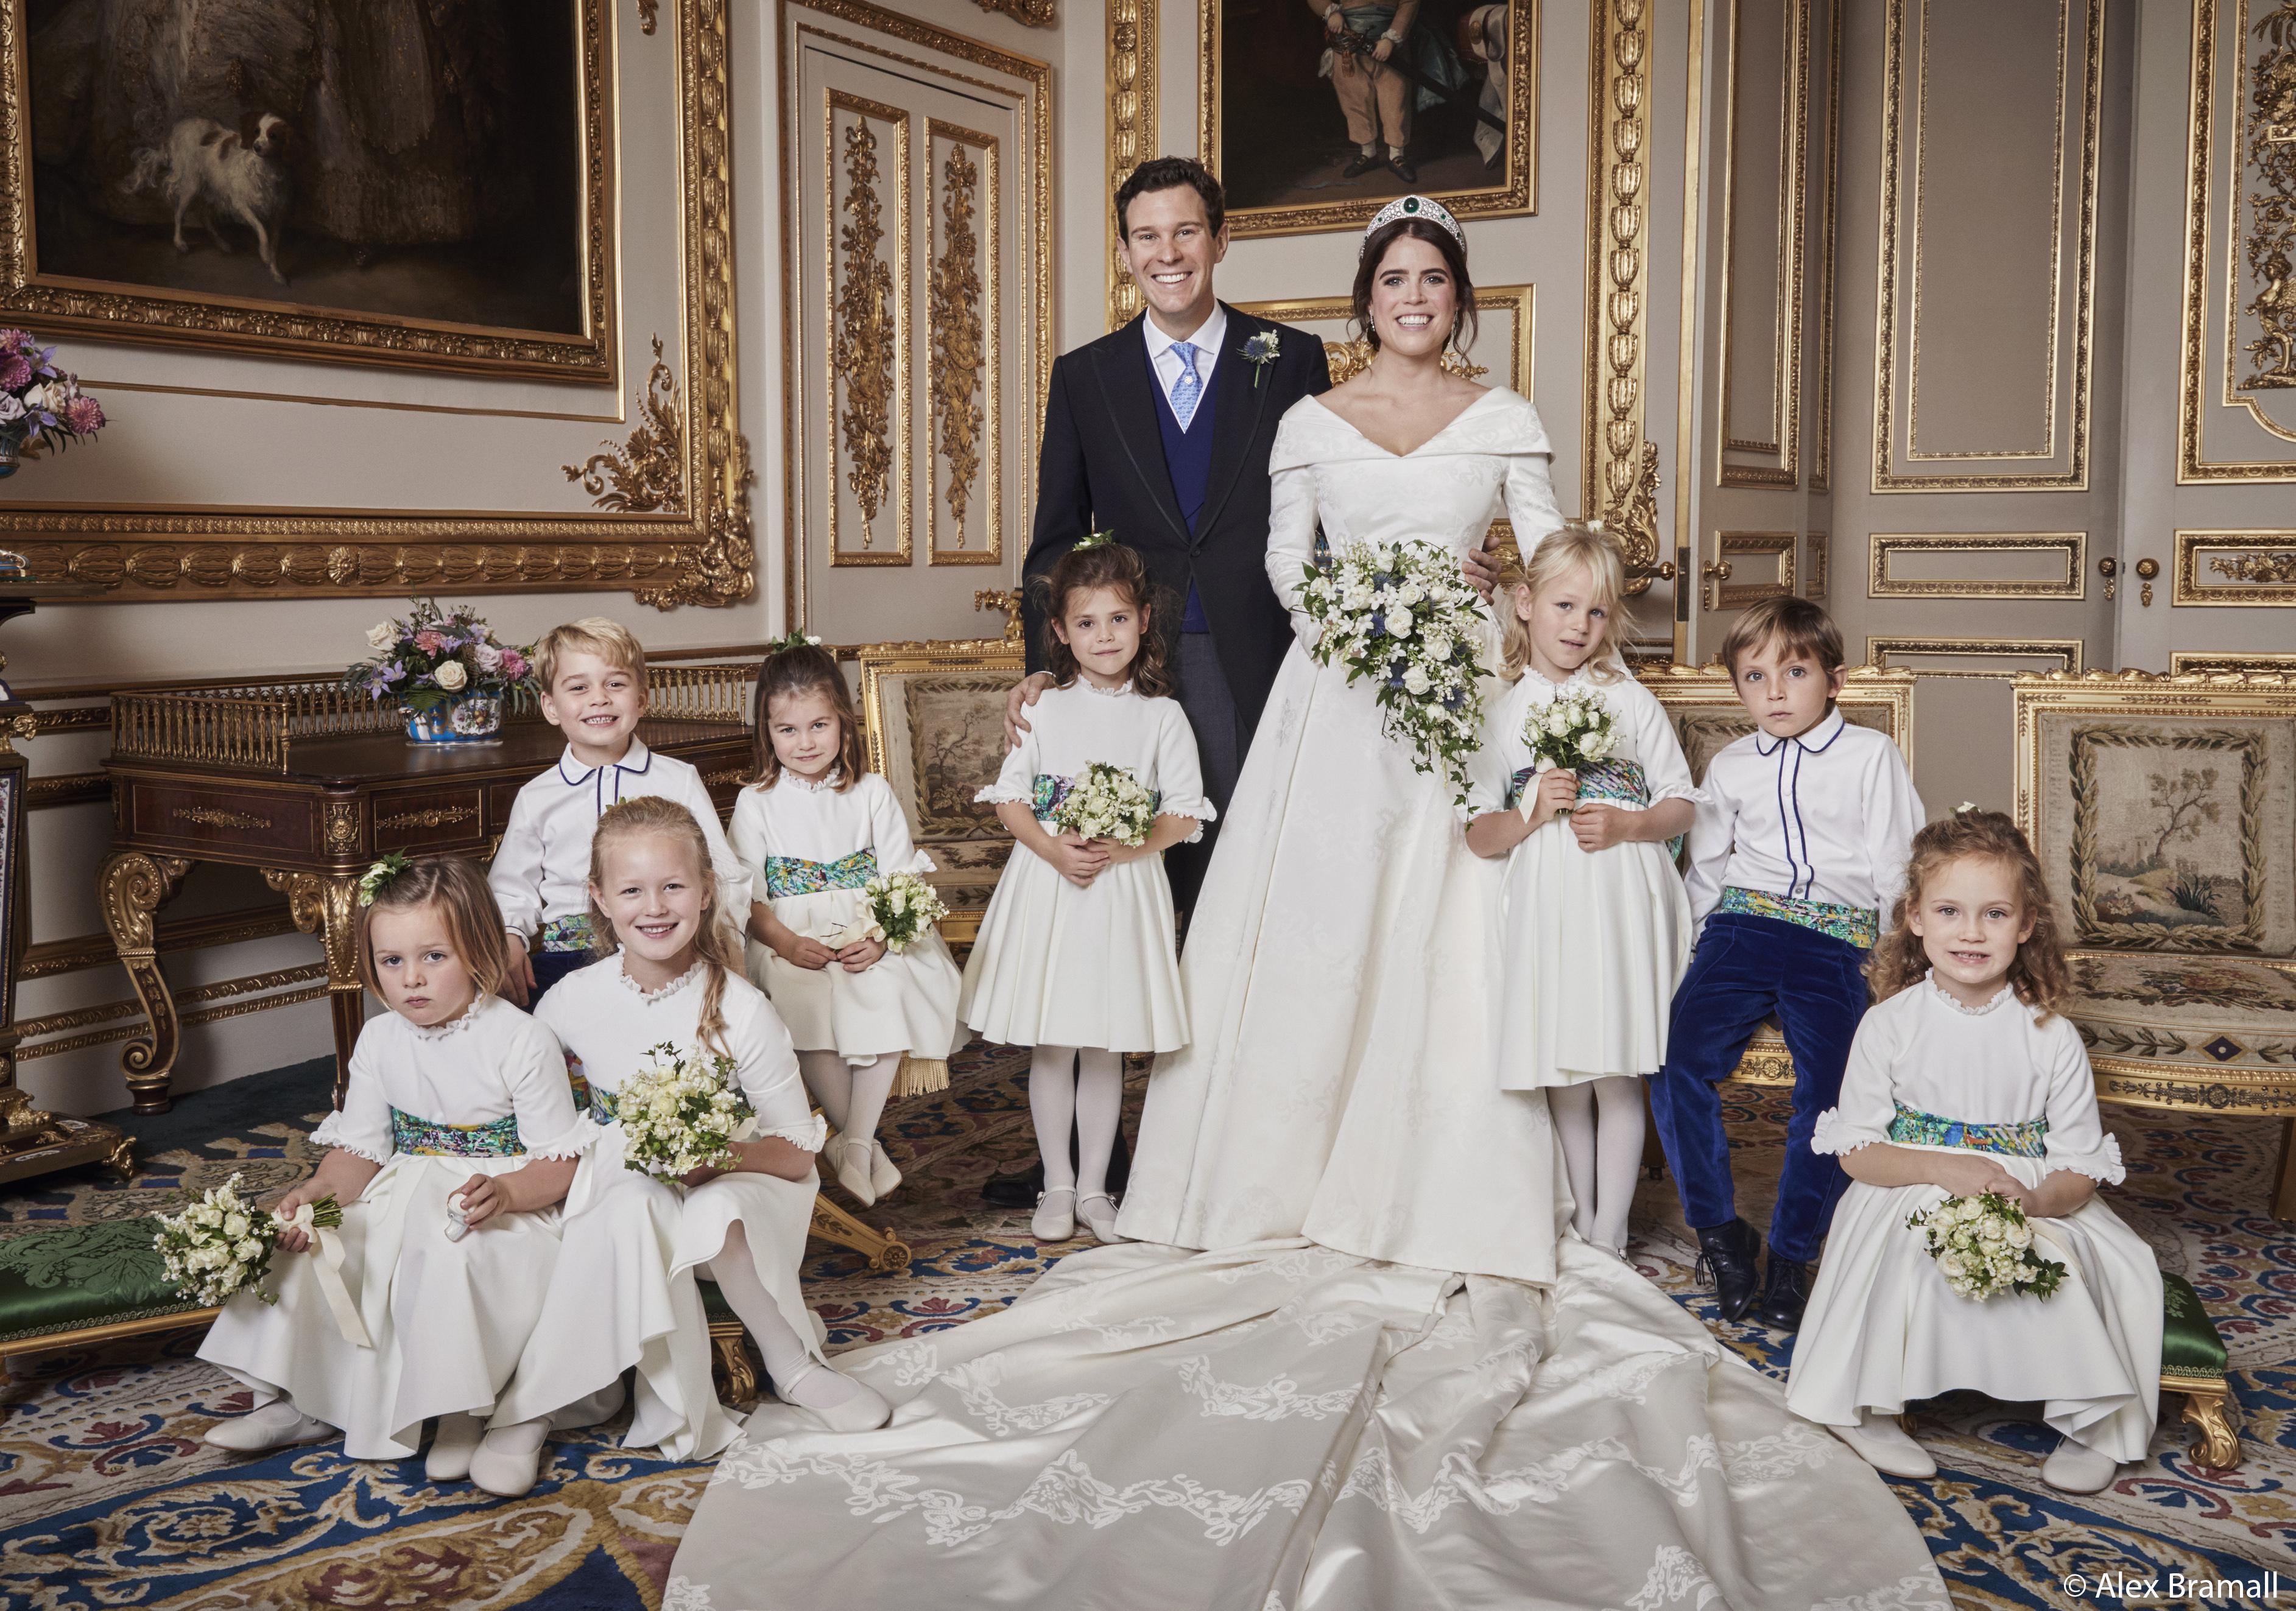 Princess Eugenie & Jack Brooksbank's Official Wedding